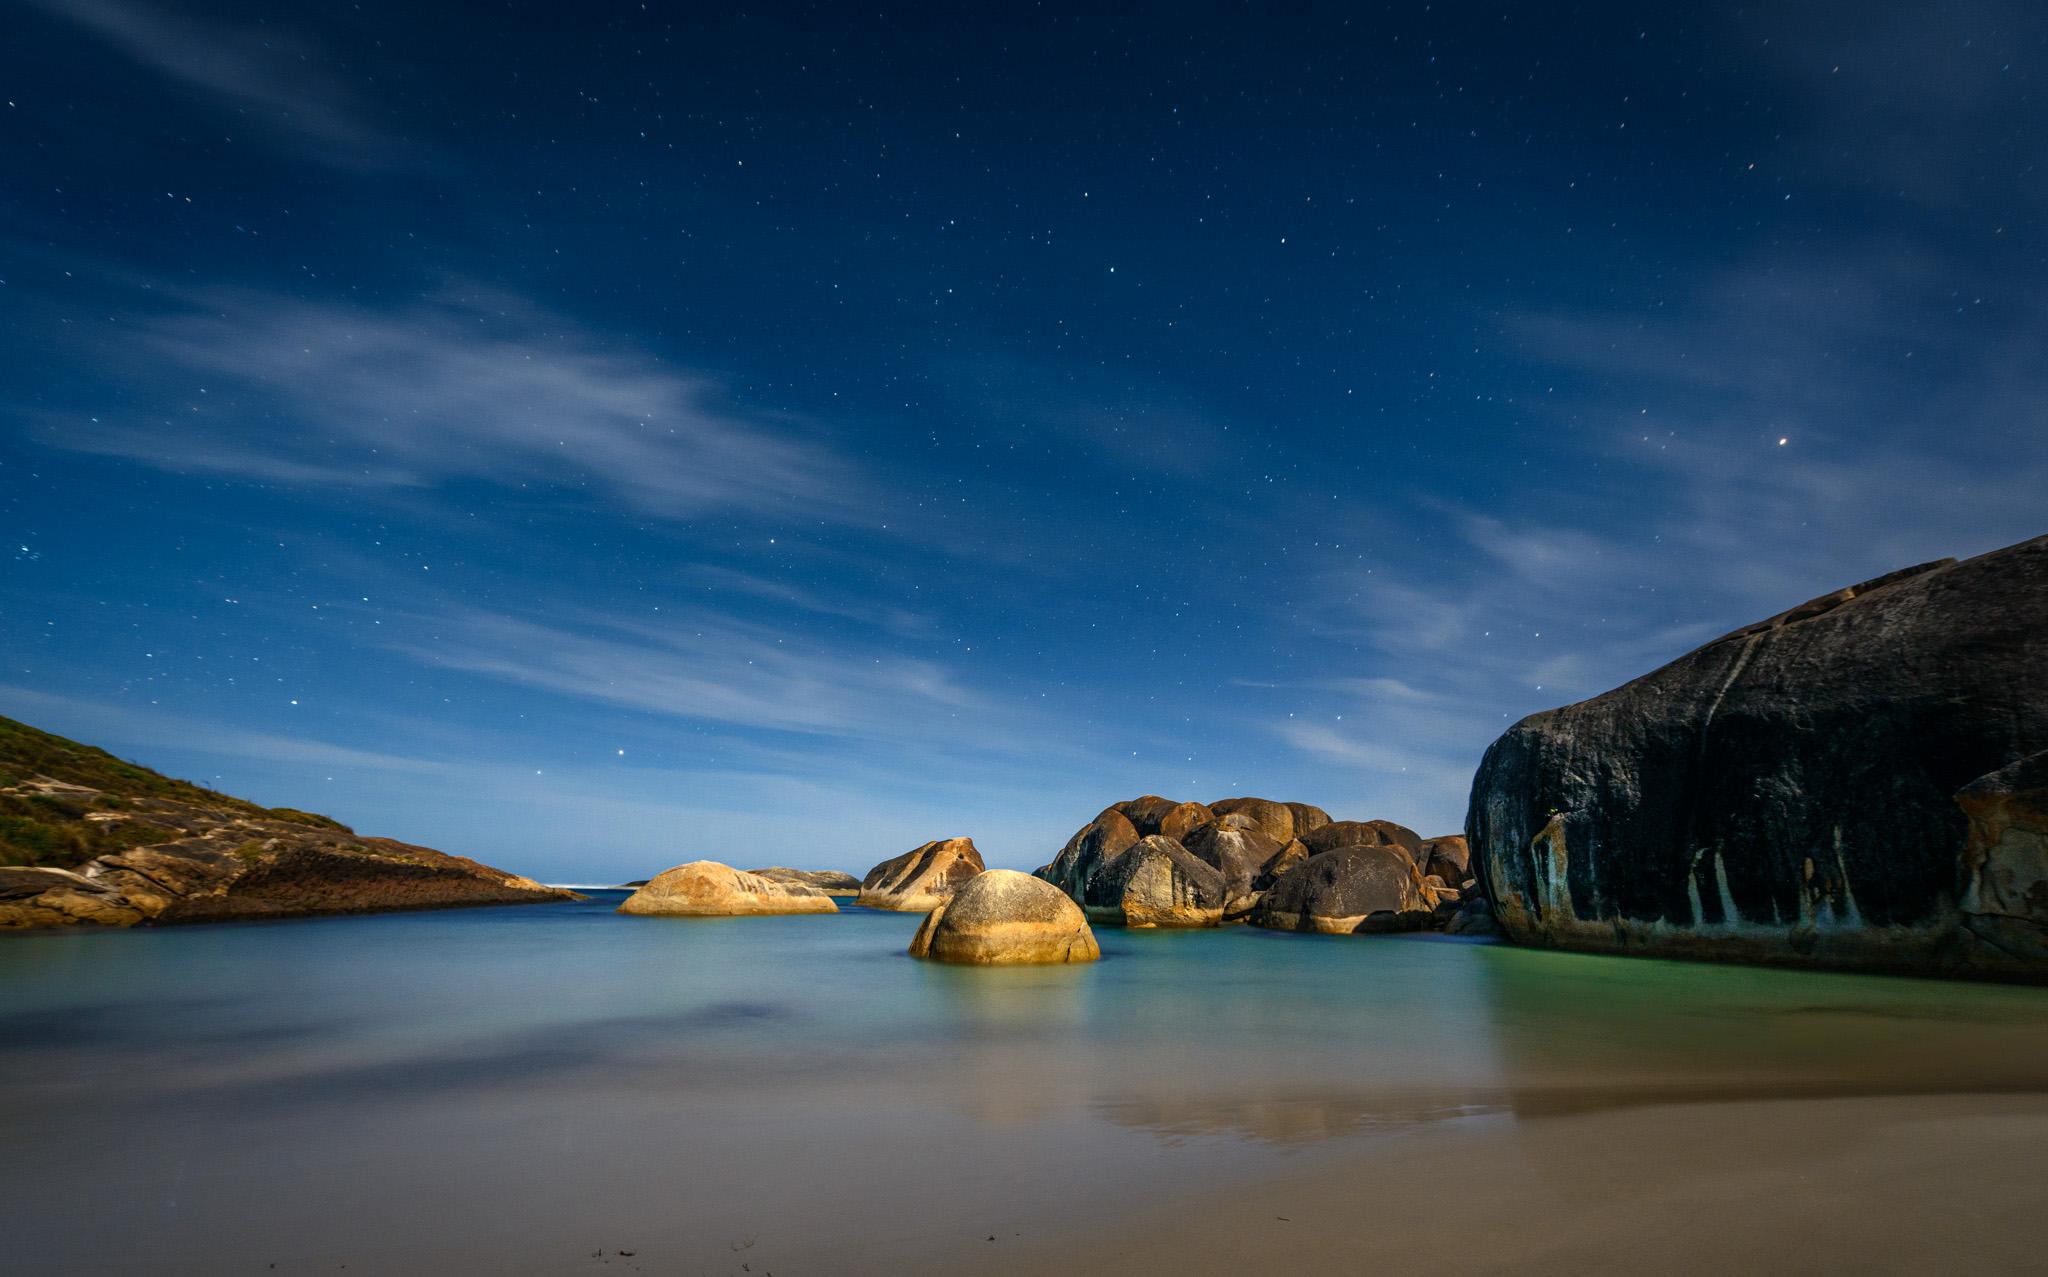 Elephant Rocks Cove in Moonlight